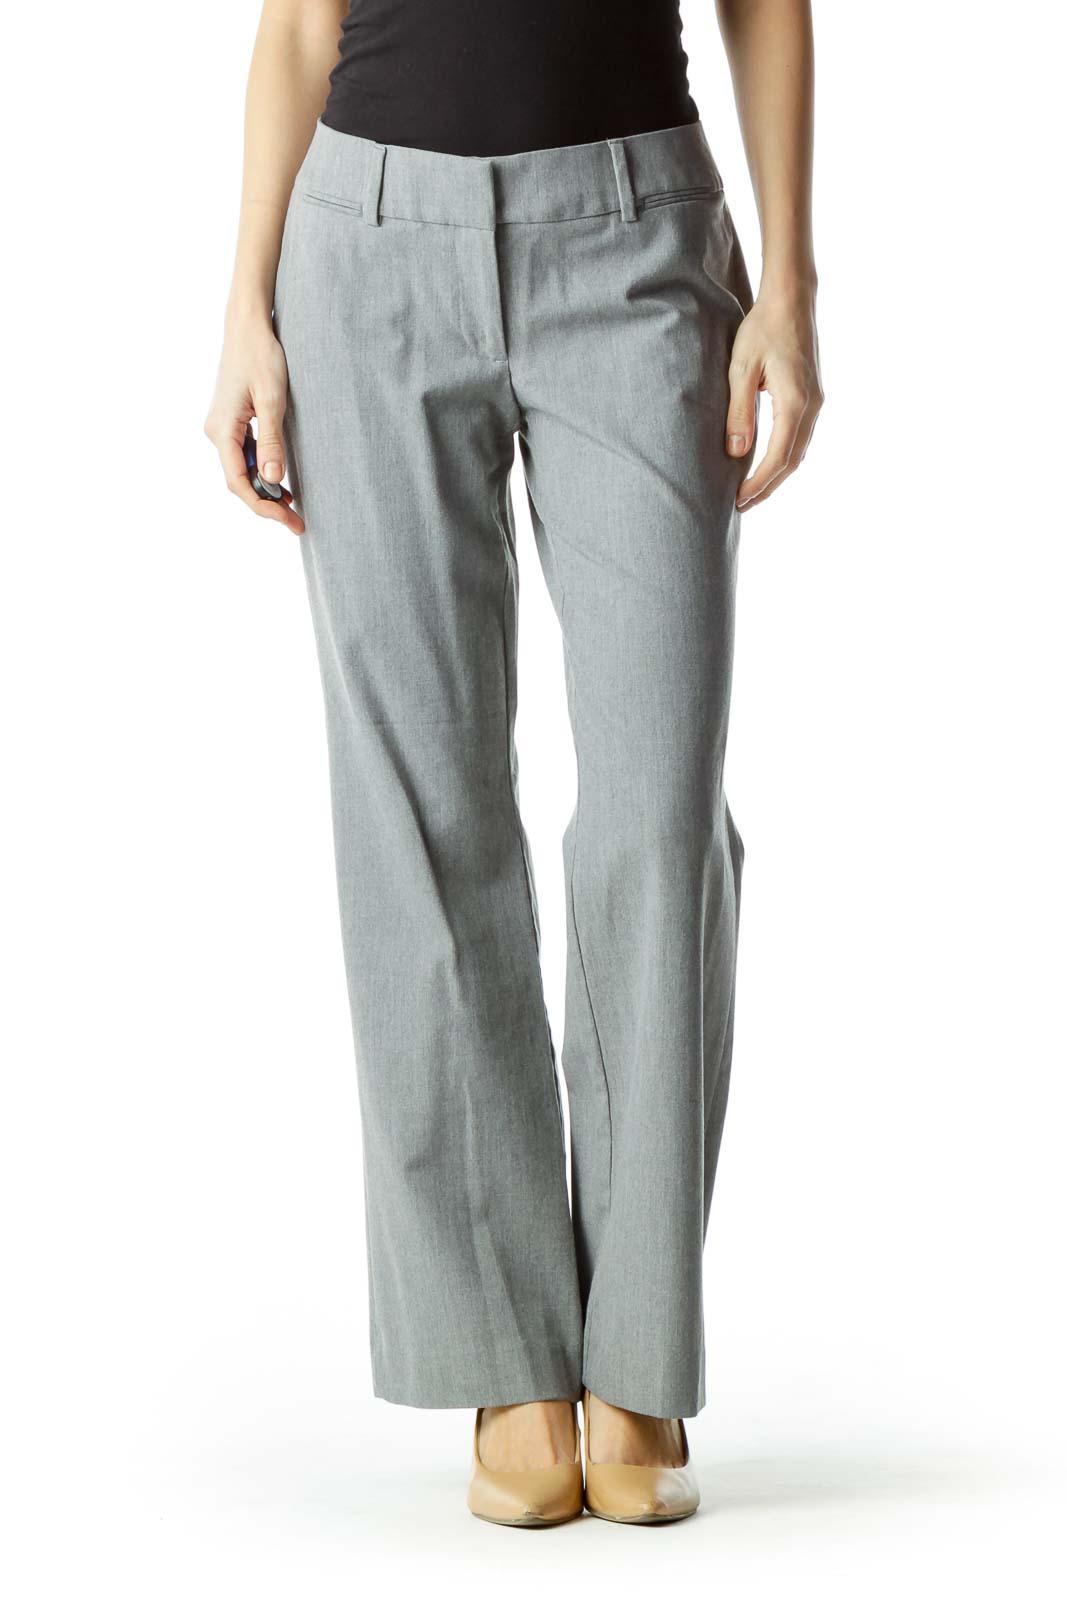 Gray Straight Leg Slacks